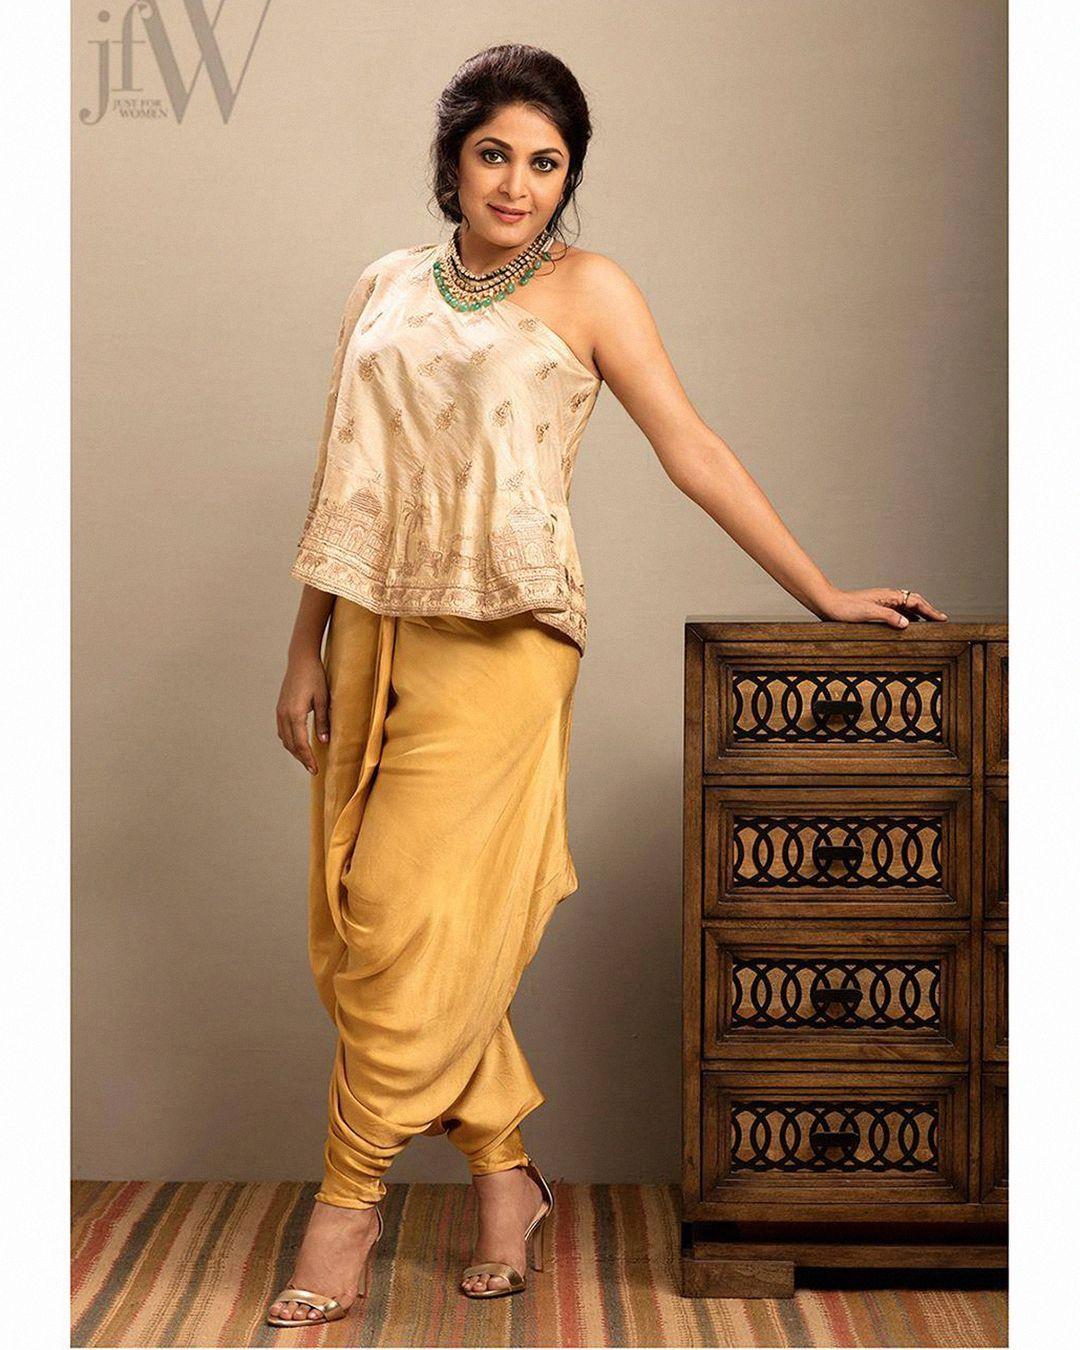 Ramya Krishnan | Indian actresses, India beauty, Fashion